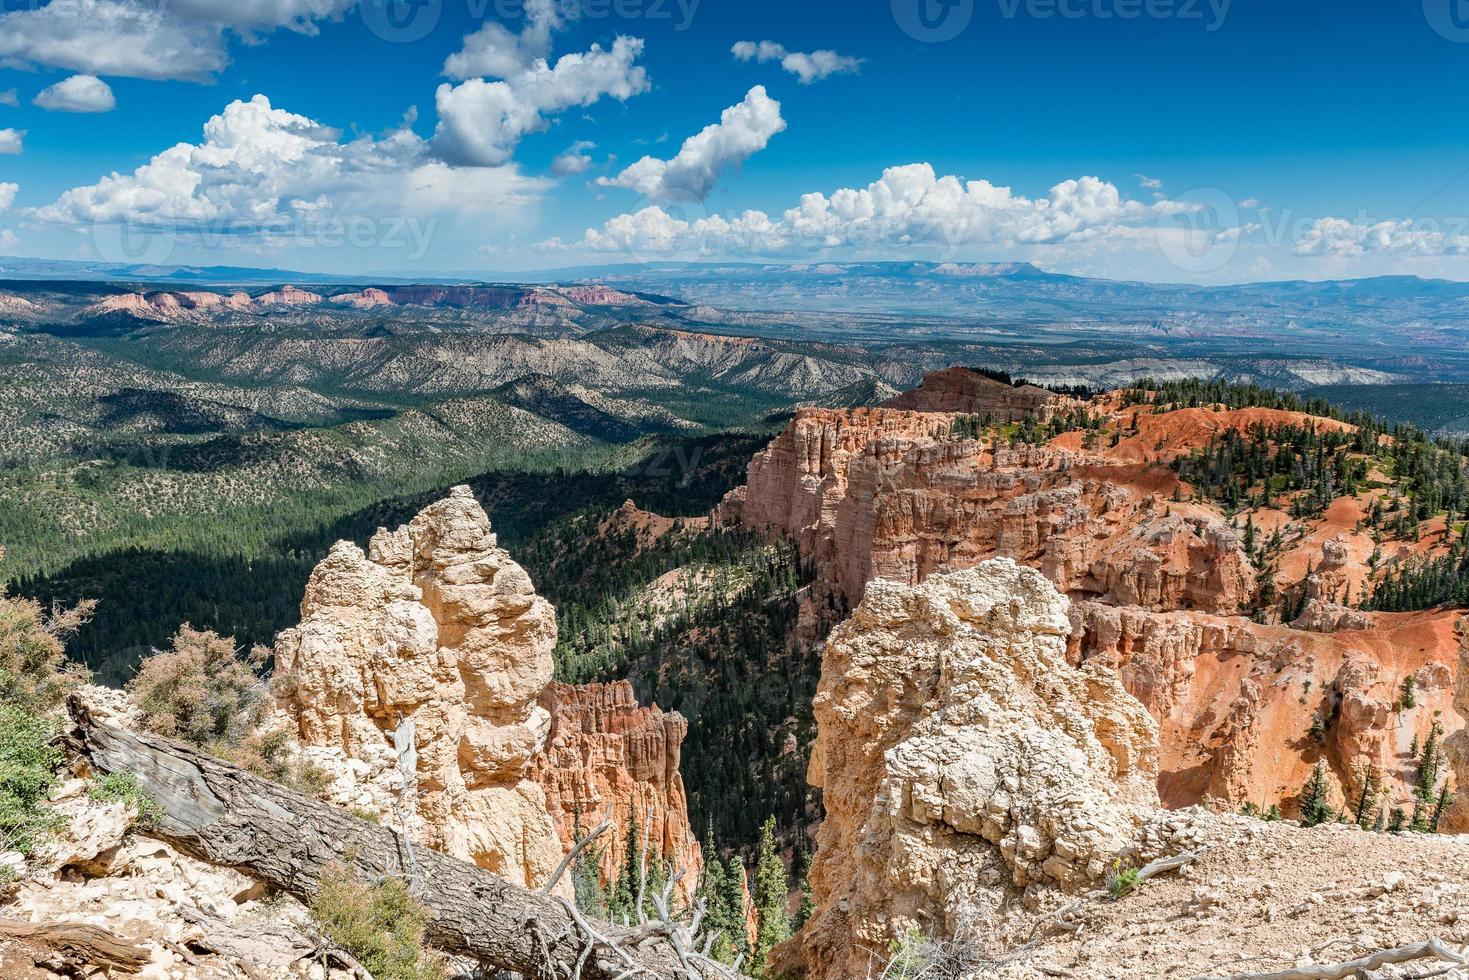 paisaje rocoso foto